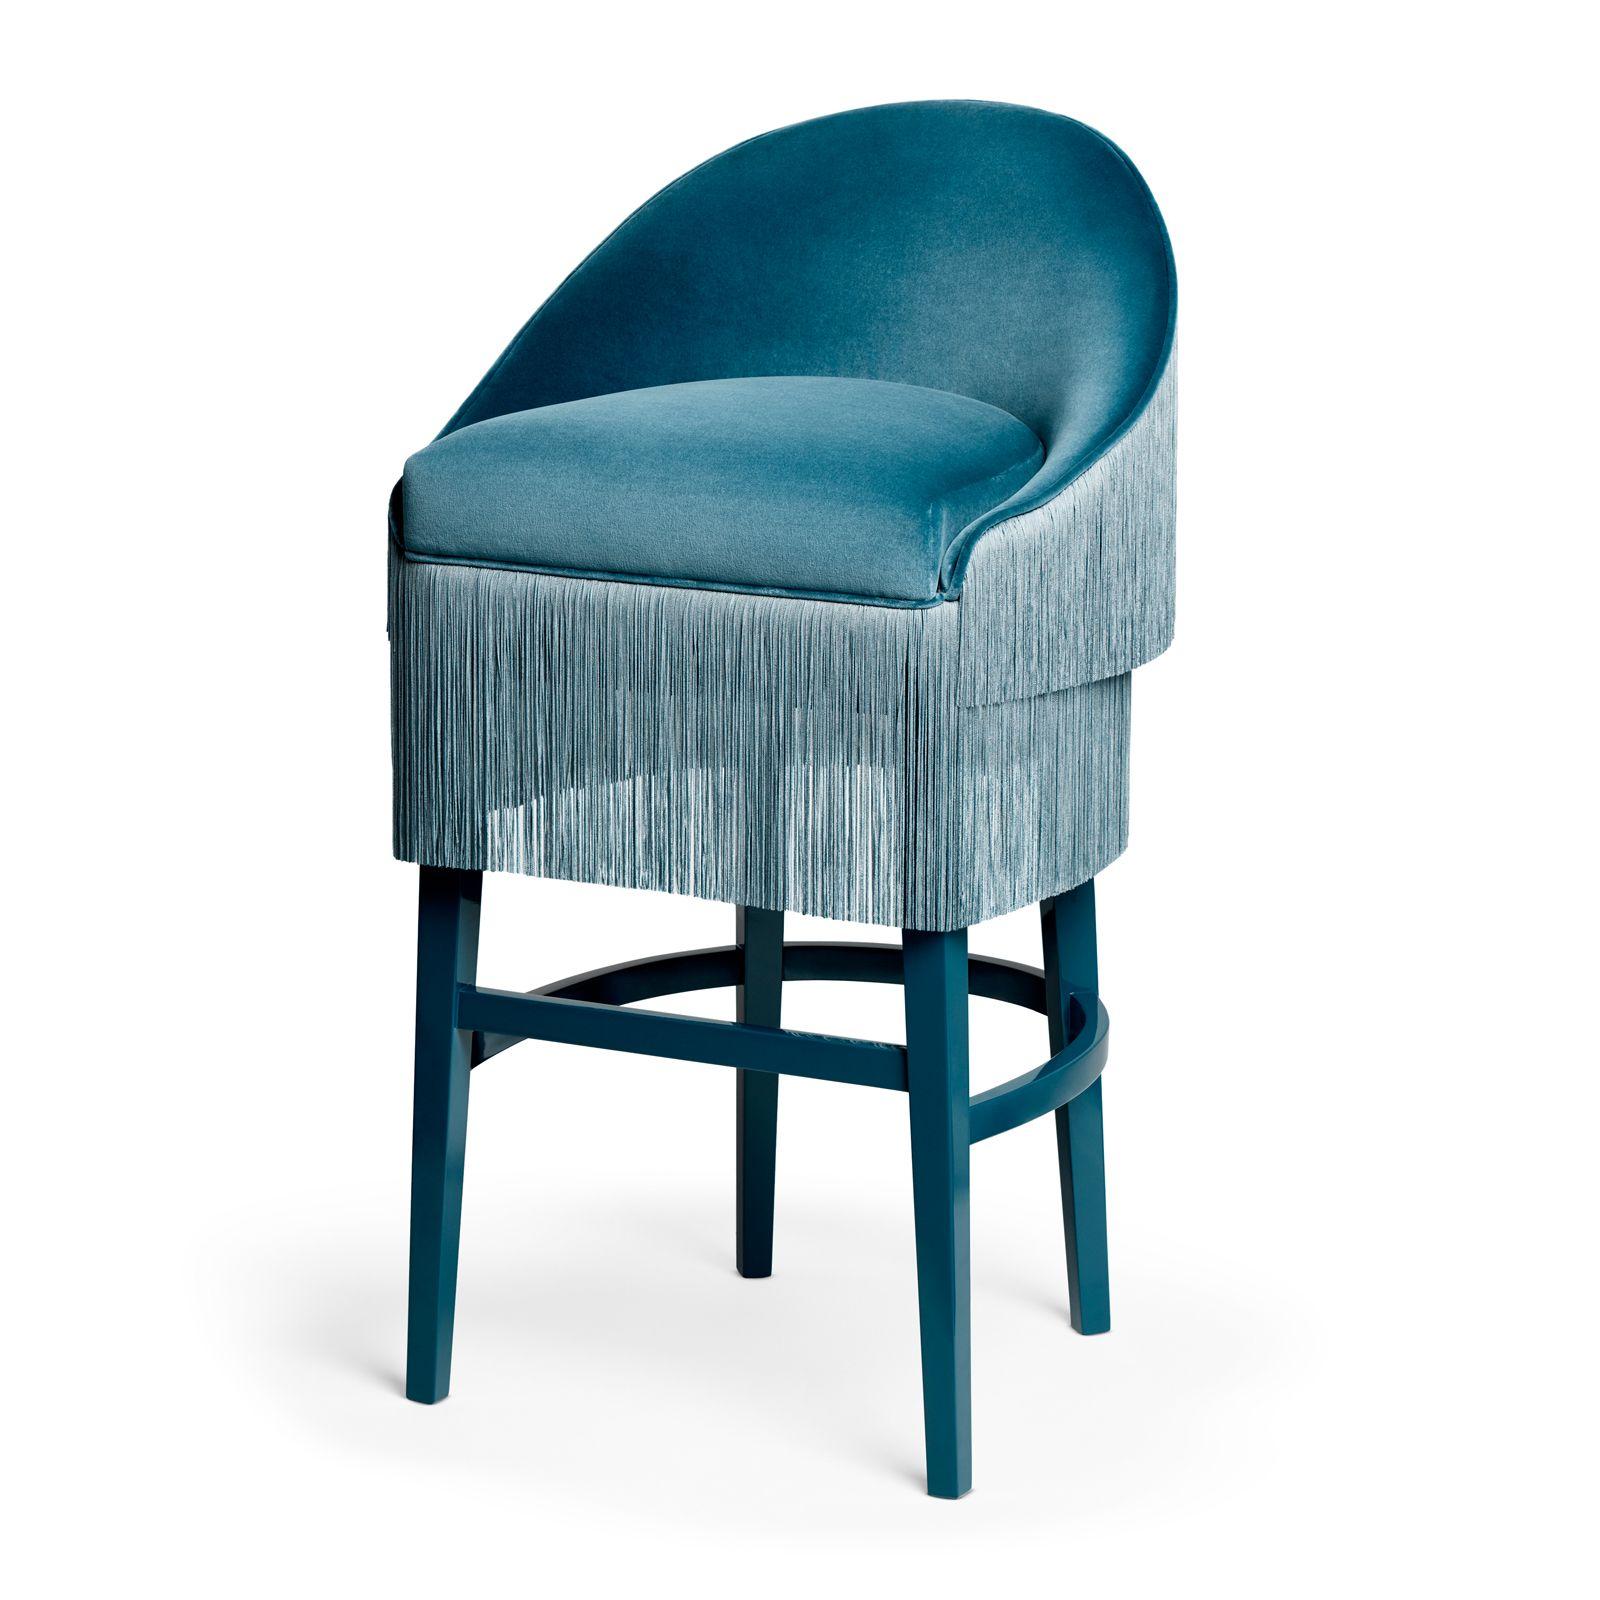 Fringe Furniture The Unexpected Trend of 2018 | Fringe bar, Bar ...